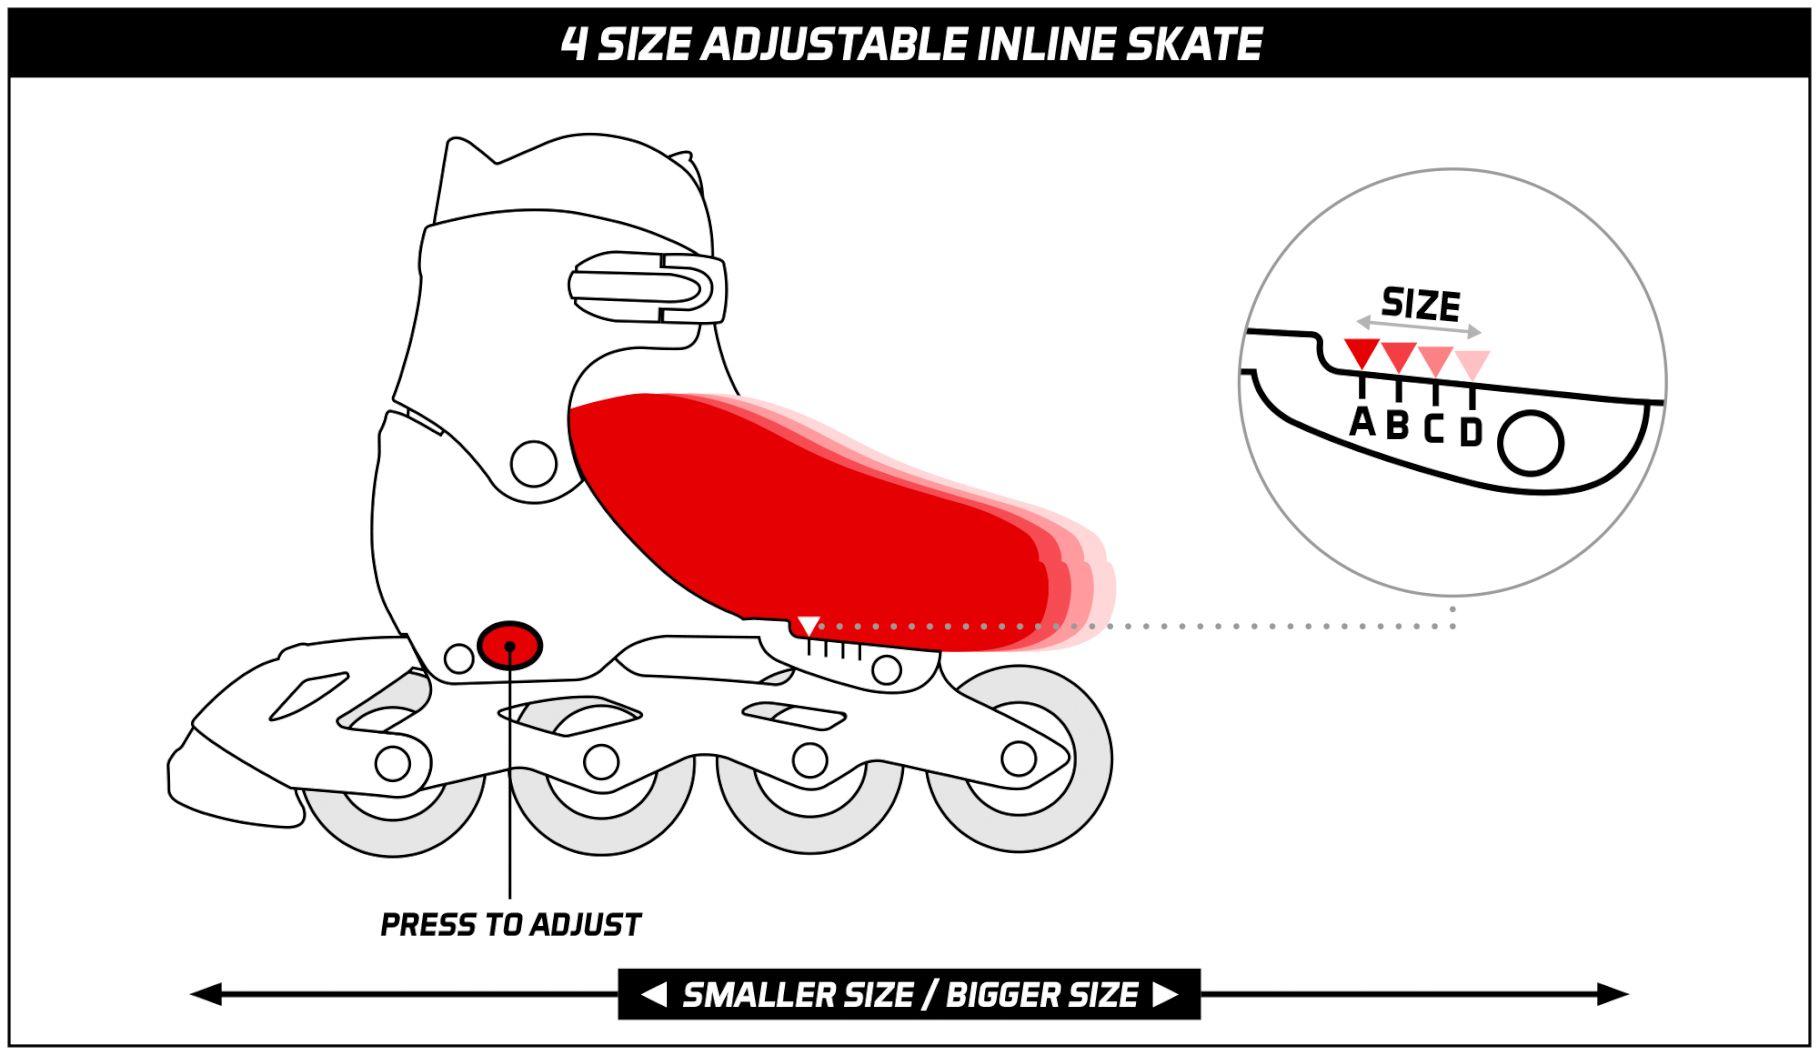 52SH-4SIZEADJUSTABLEINLINESKATE